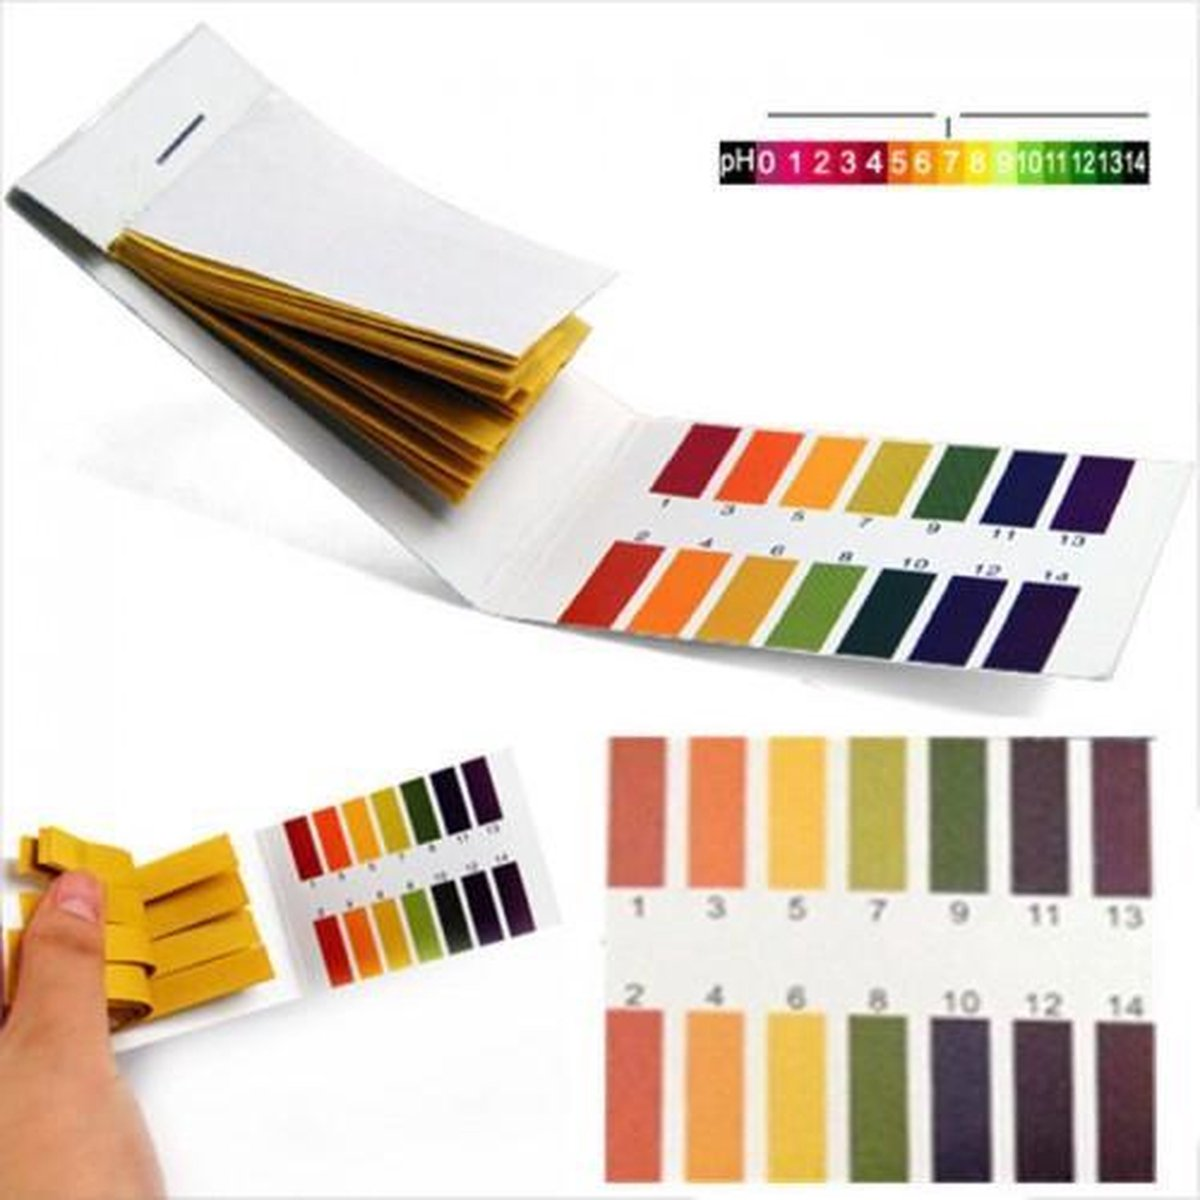 Lakmoes Papier test strips PH 1-14